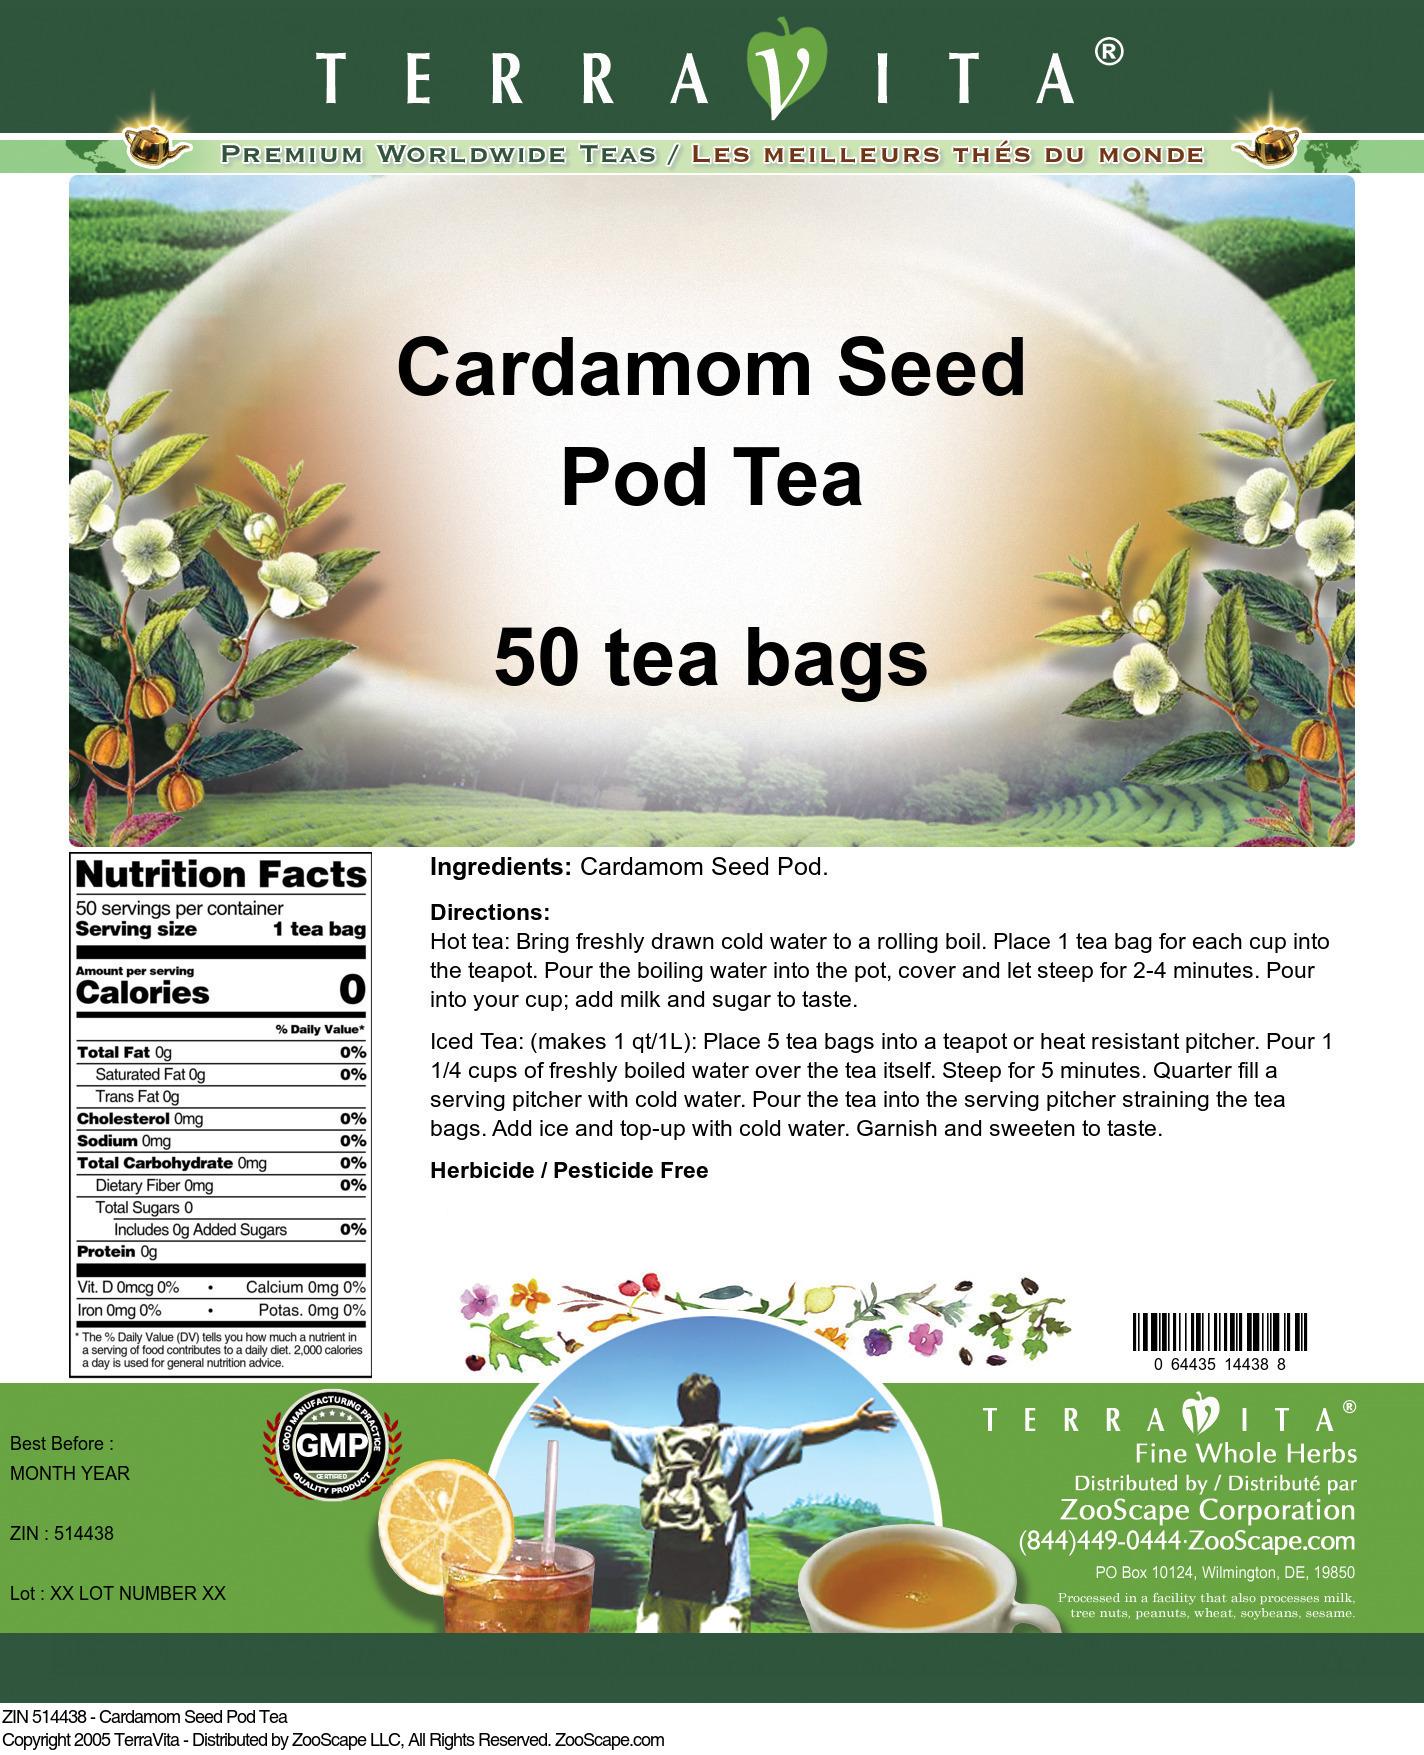 Cardamom Seed Pod Tea